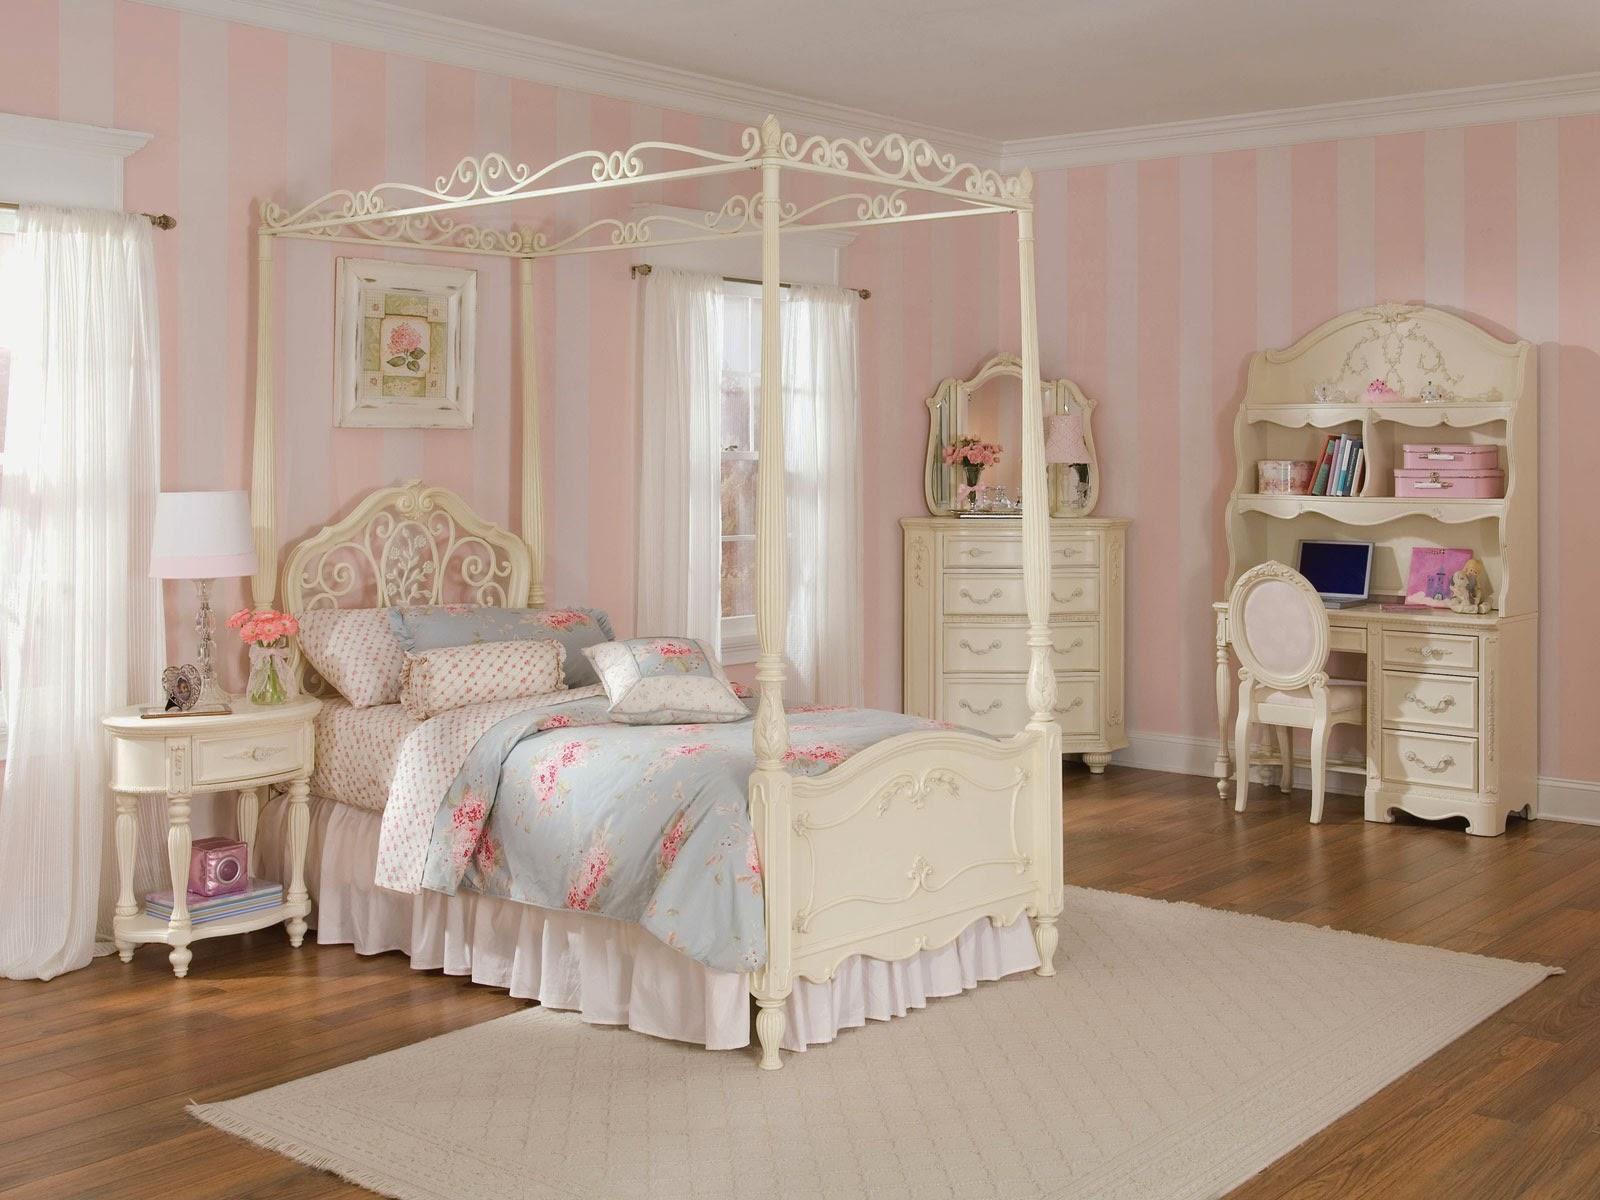 kamar tidur cantik untuk anak perempuan